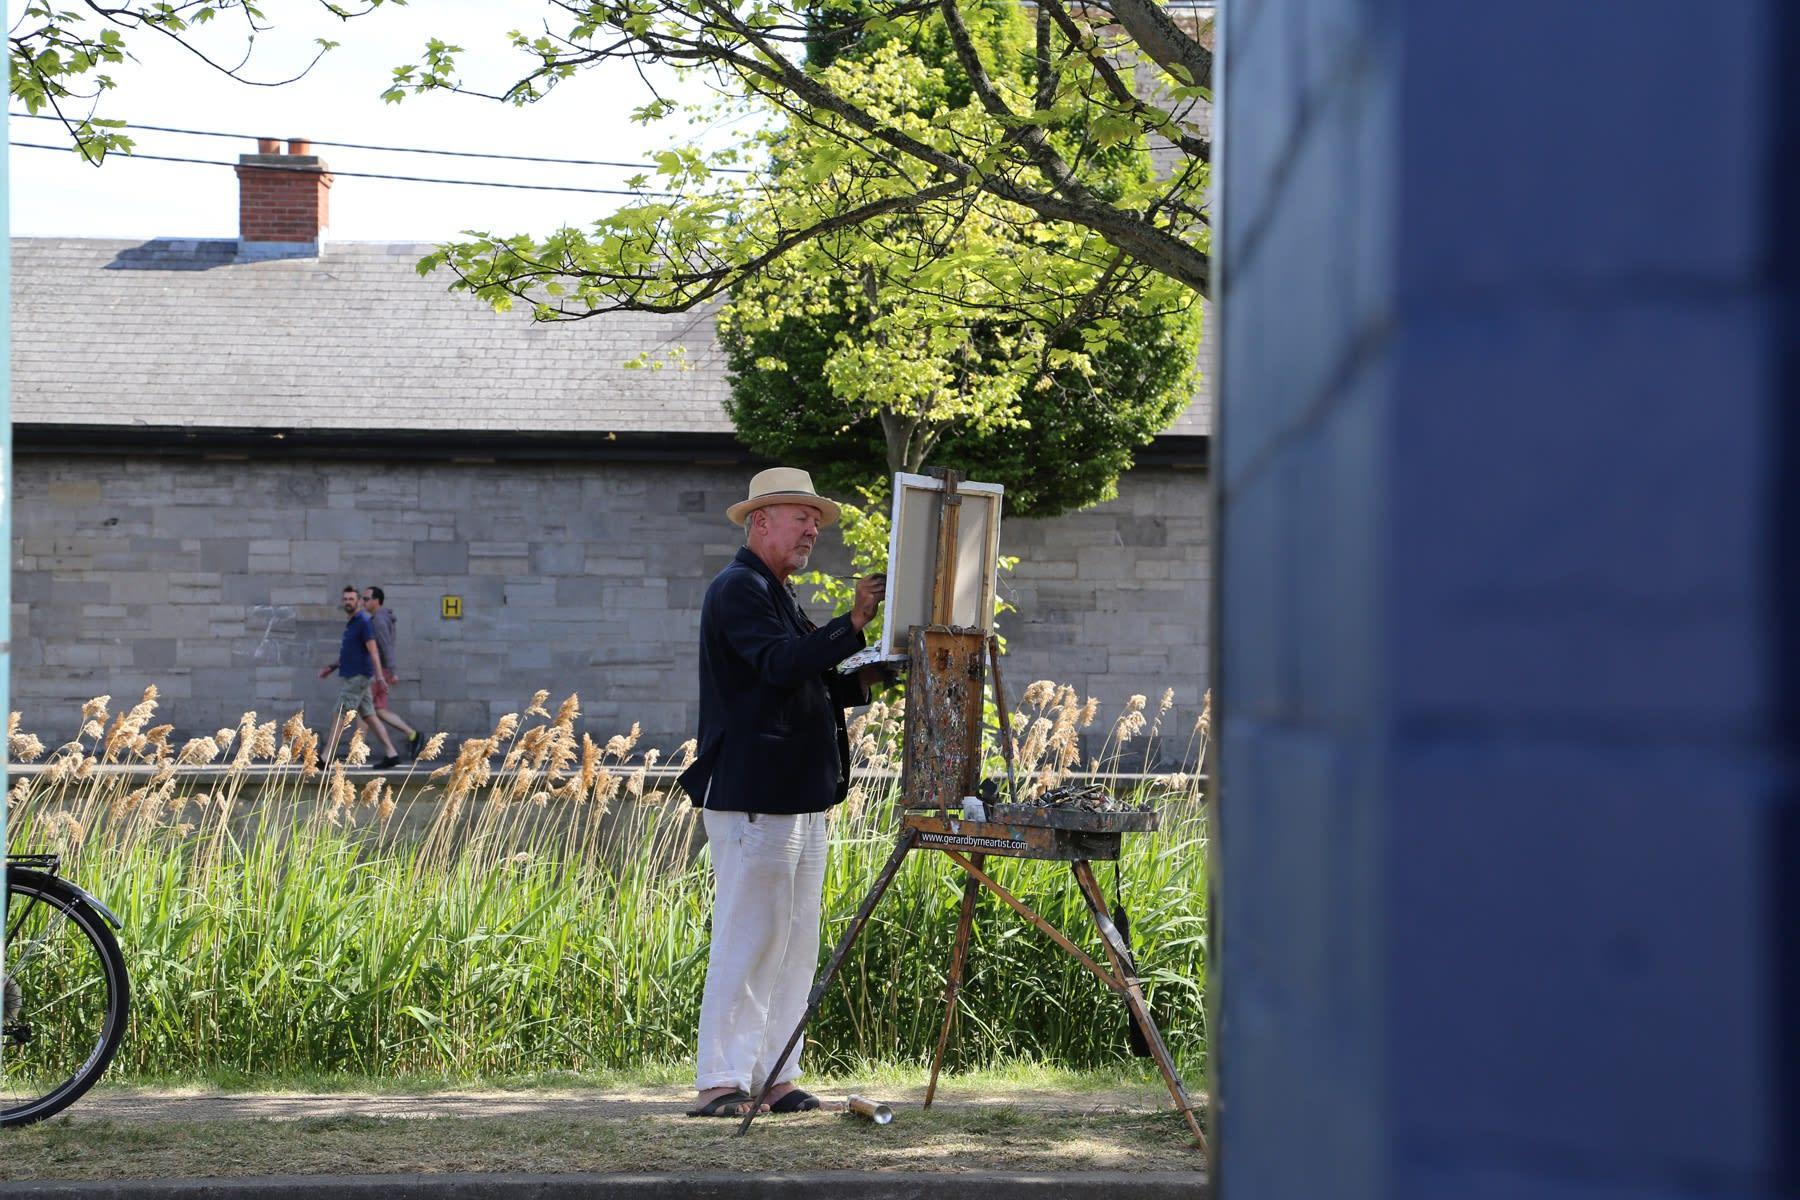 01 JUNE 2020 LOCKS RESTAURANT, WINDSOR TERRACE, DUBLIN The Door to the Unknown photo: Agata Byrne